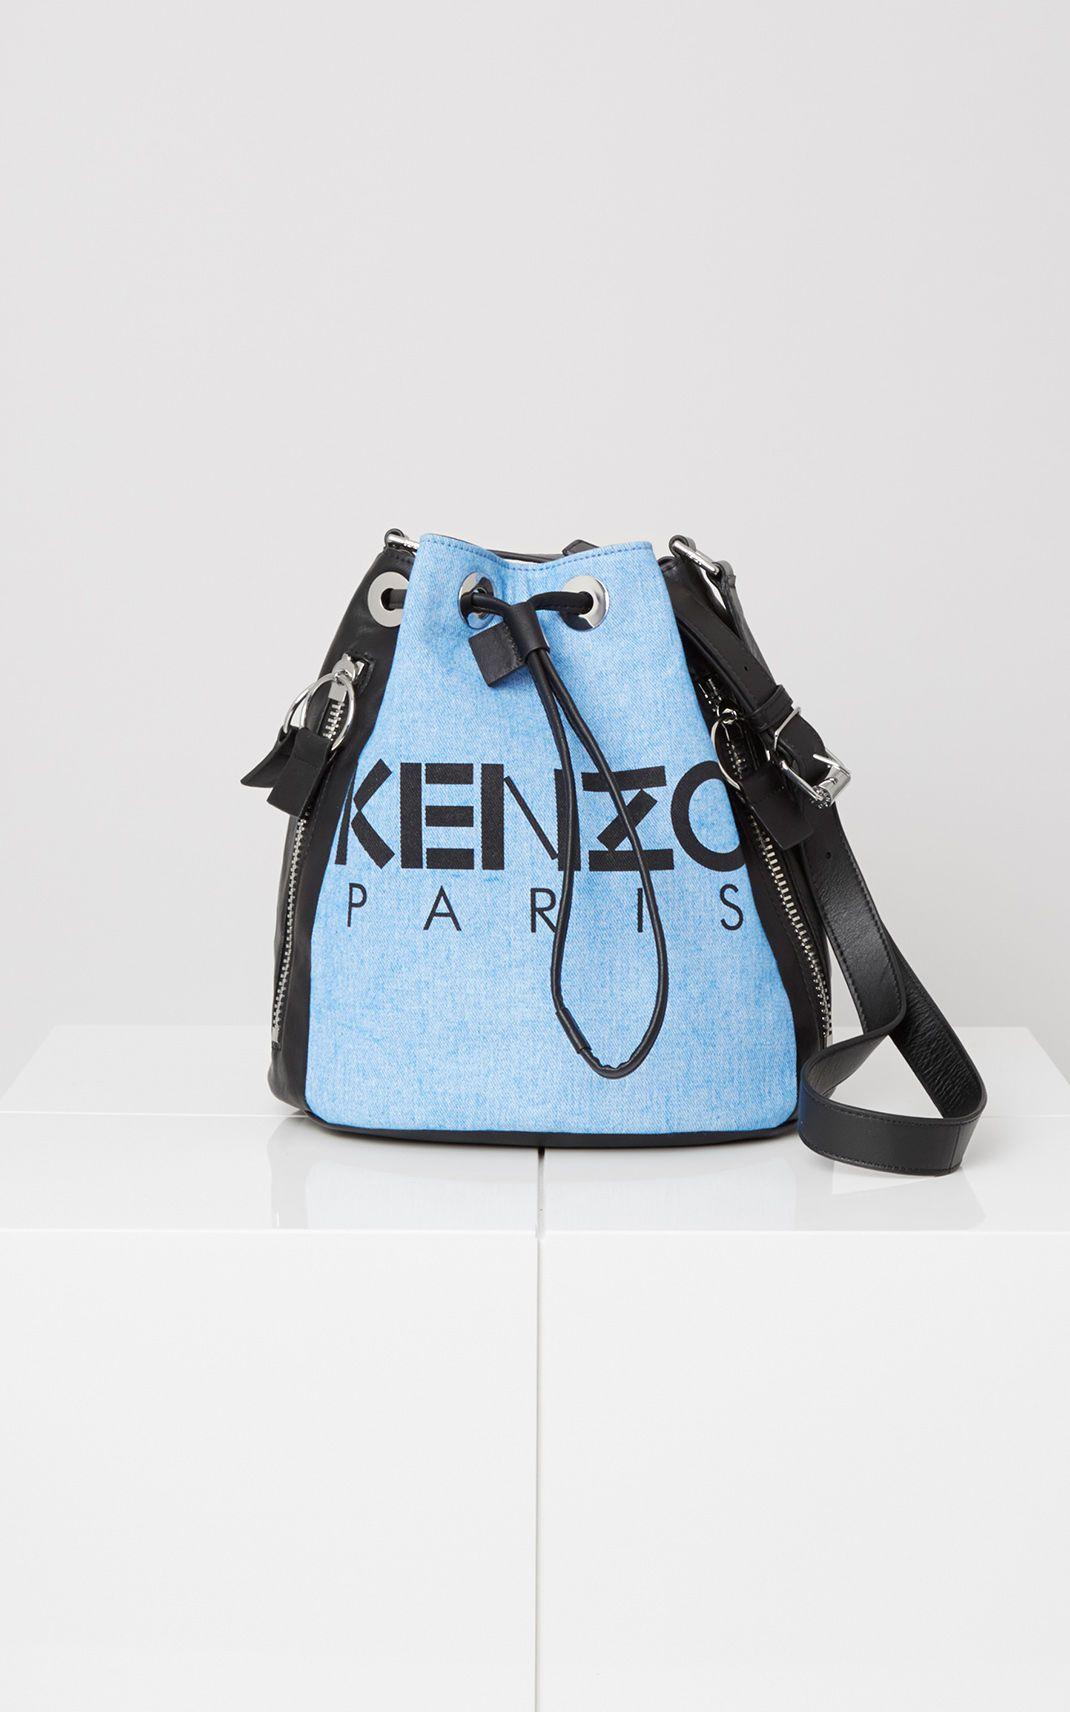 afc4e6b9c0 KENZO Kanvas Bucket Bag for Kenzo | Kenzo.com | Wish List Summer ...